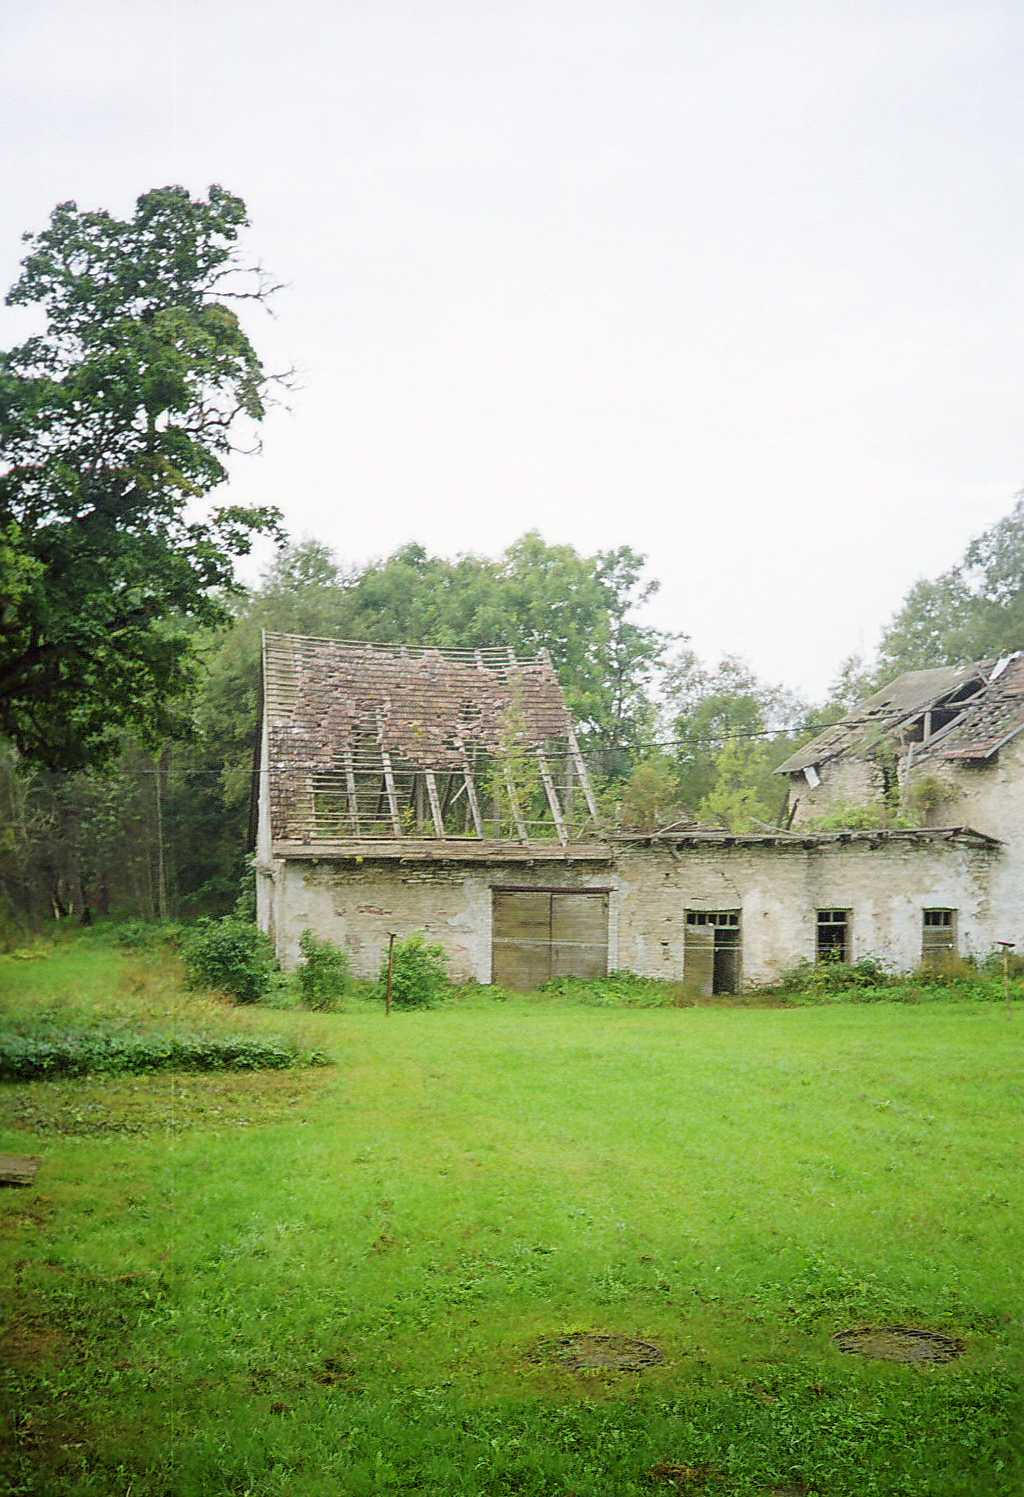 kolga mansion houses 1 by piraaja